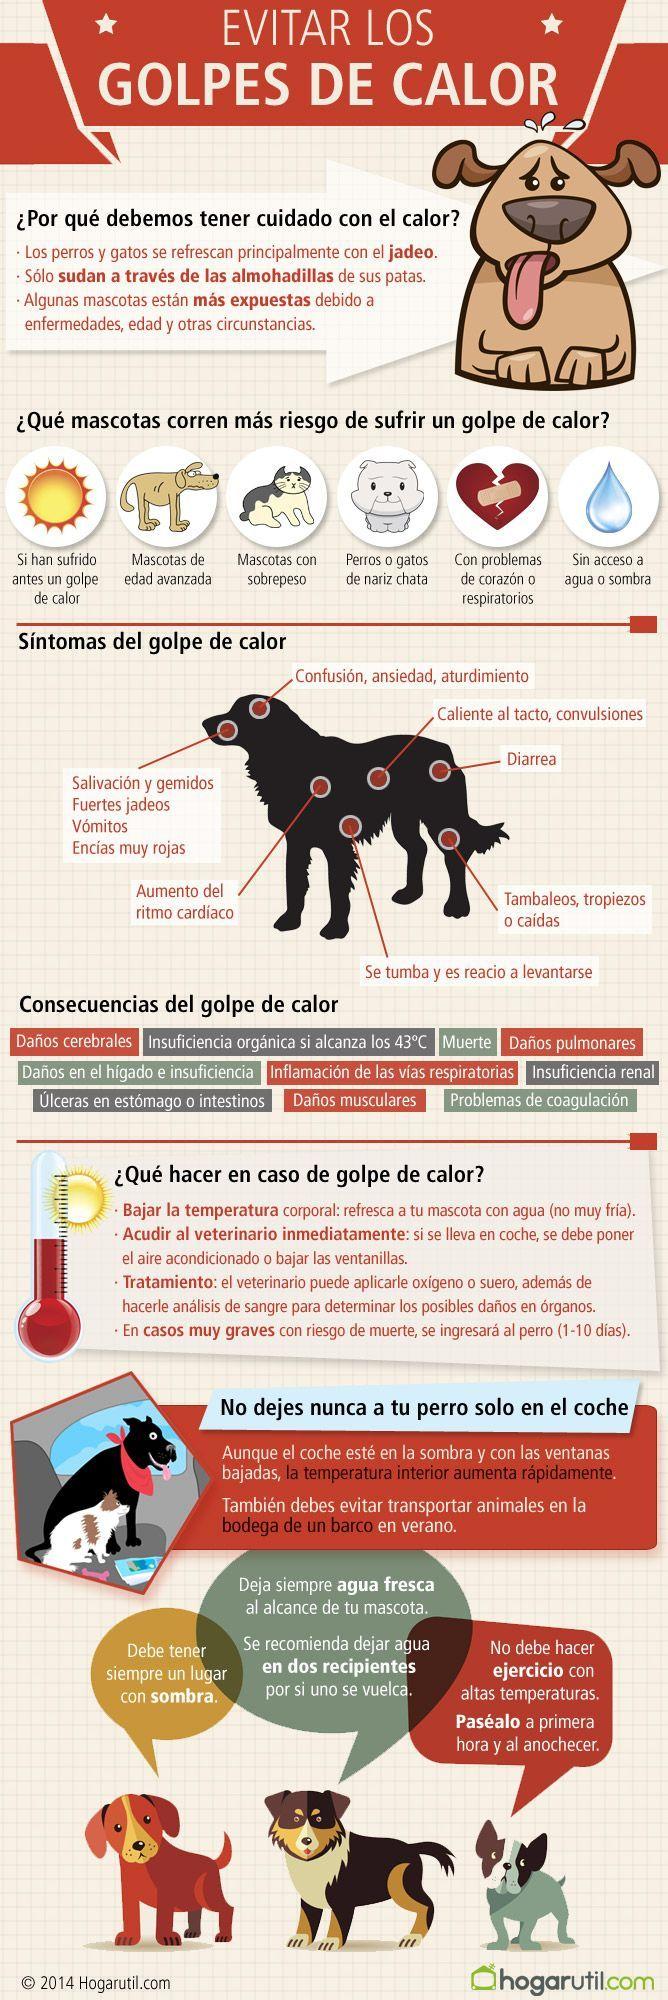 Qué hacer si tu mascota sufre un golpe de calor #mascotas #perros #calor